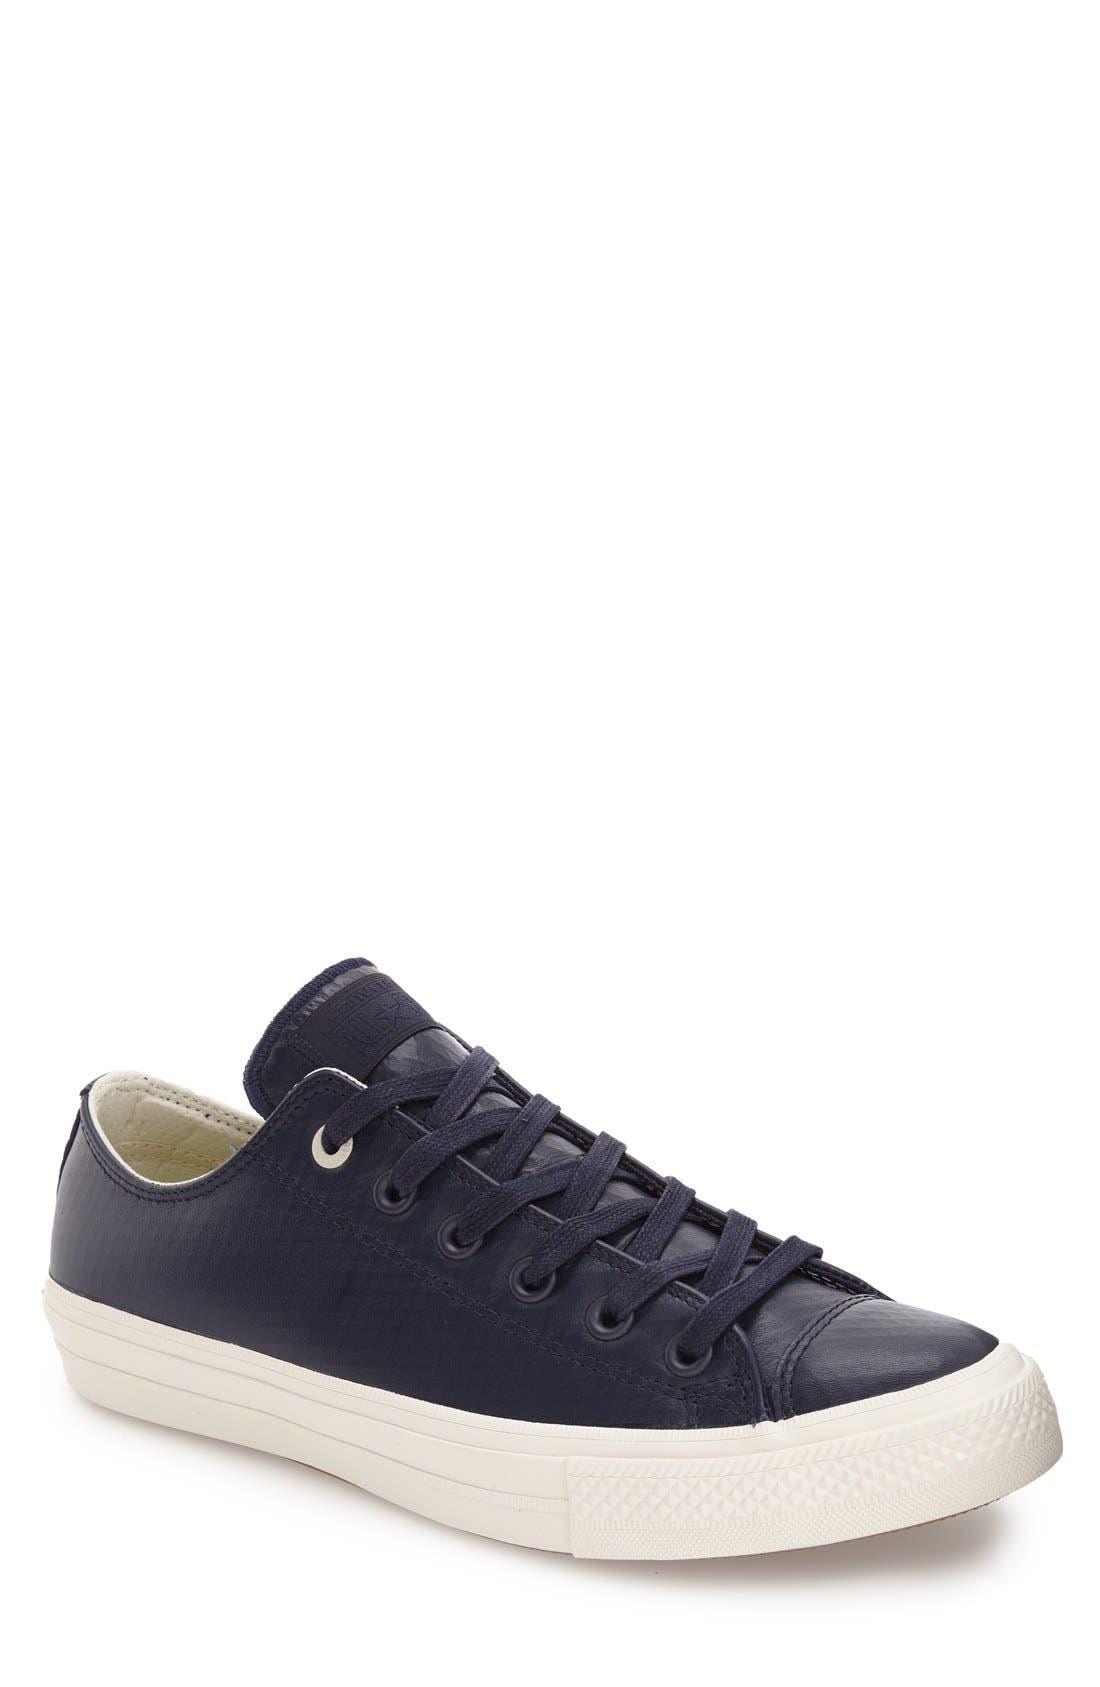 Main Image - Converse Chuck Taylor® All Star® II Sneaker (Men)